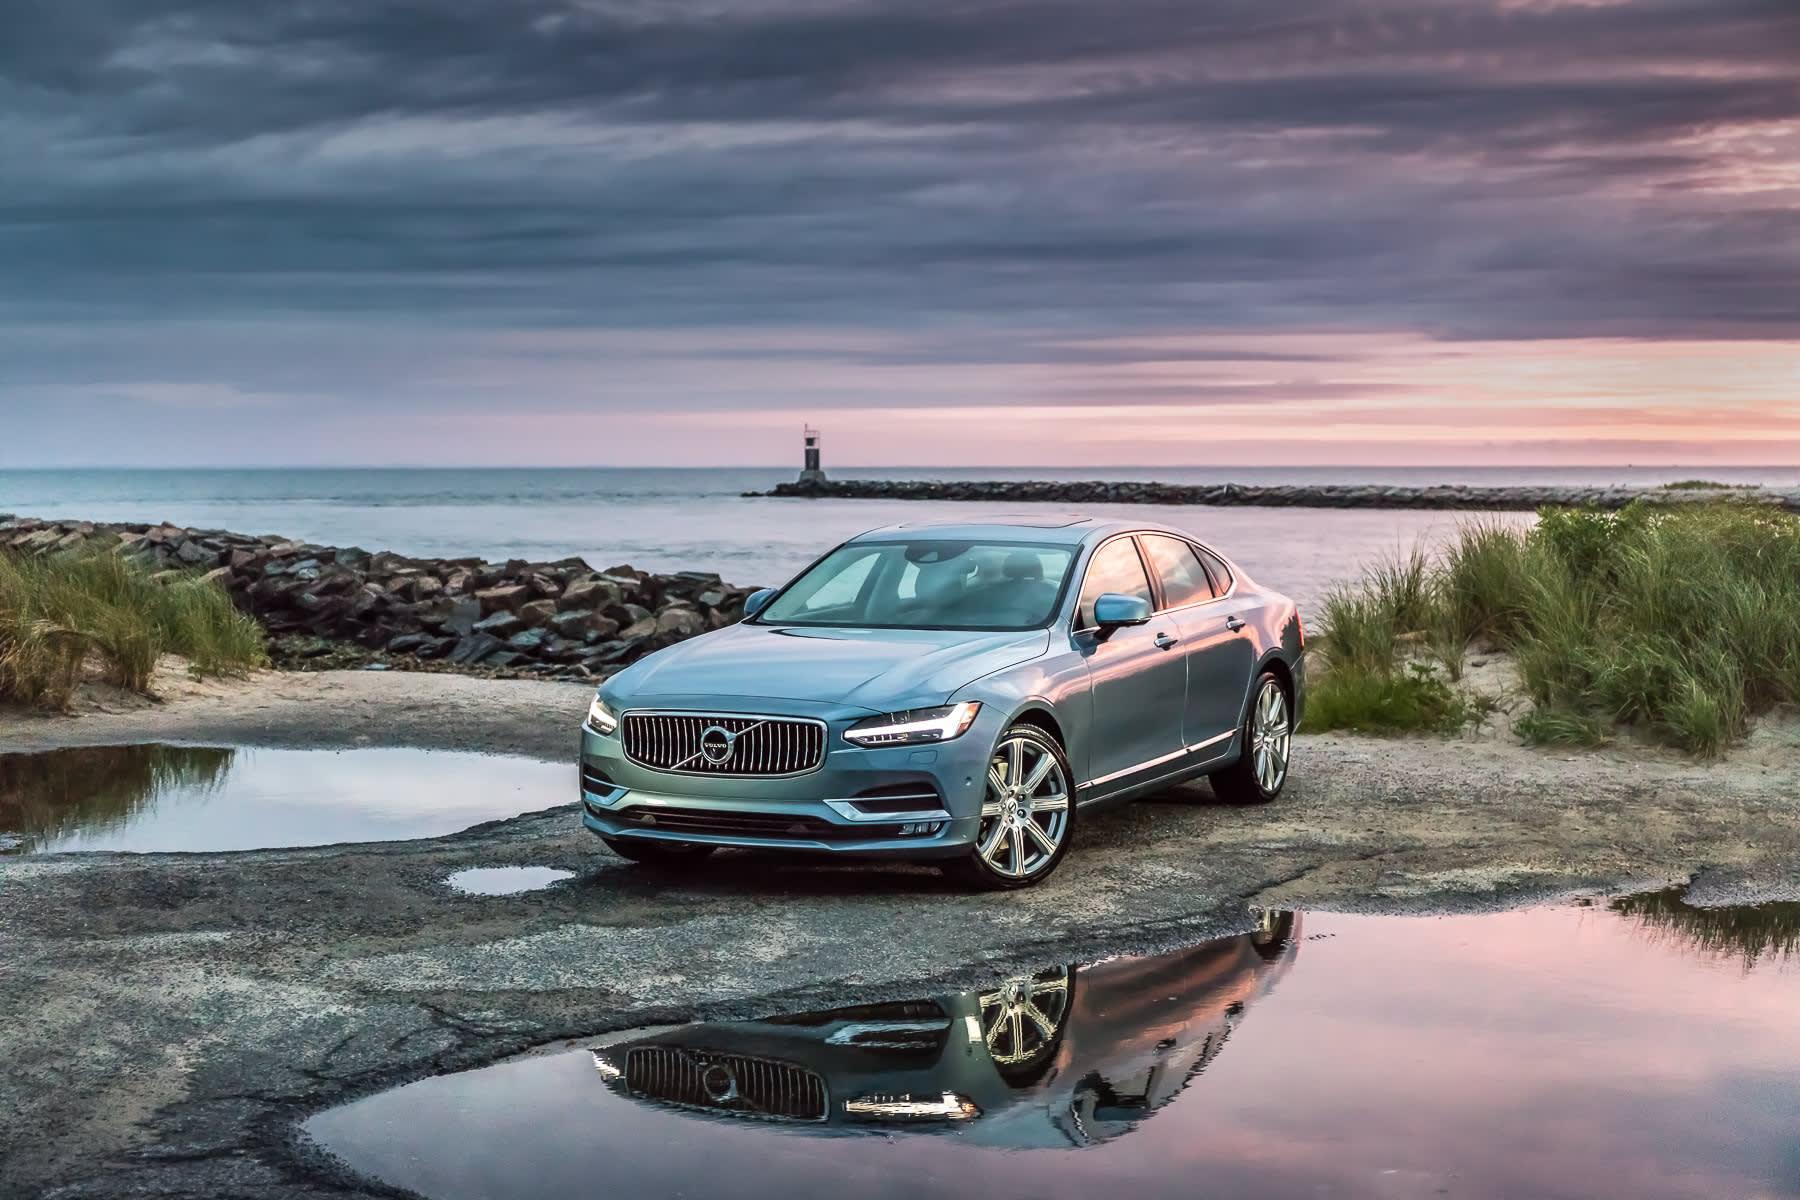 2017 Volvo S90 Review A High Tech Luxury Sedan